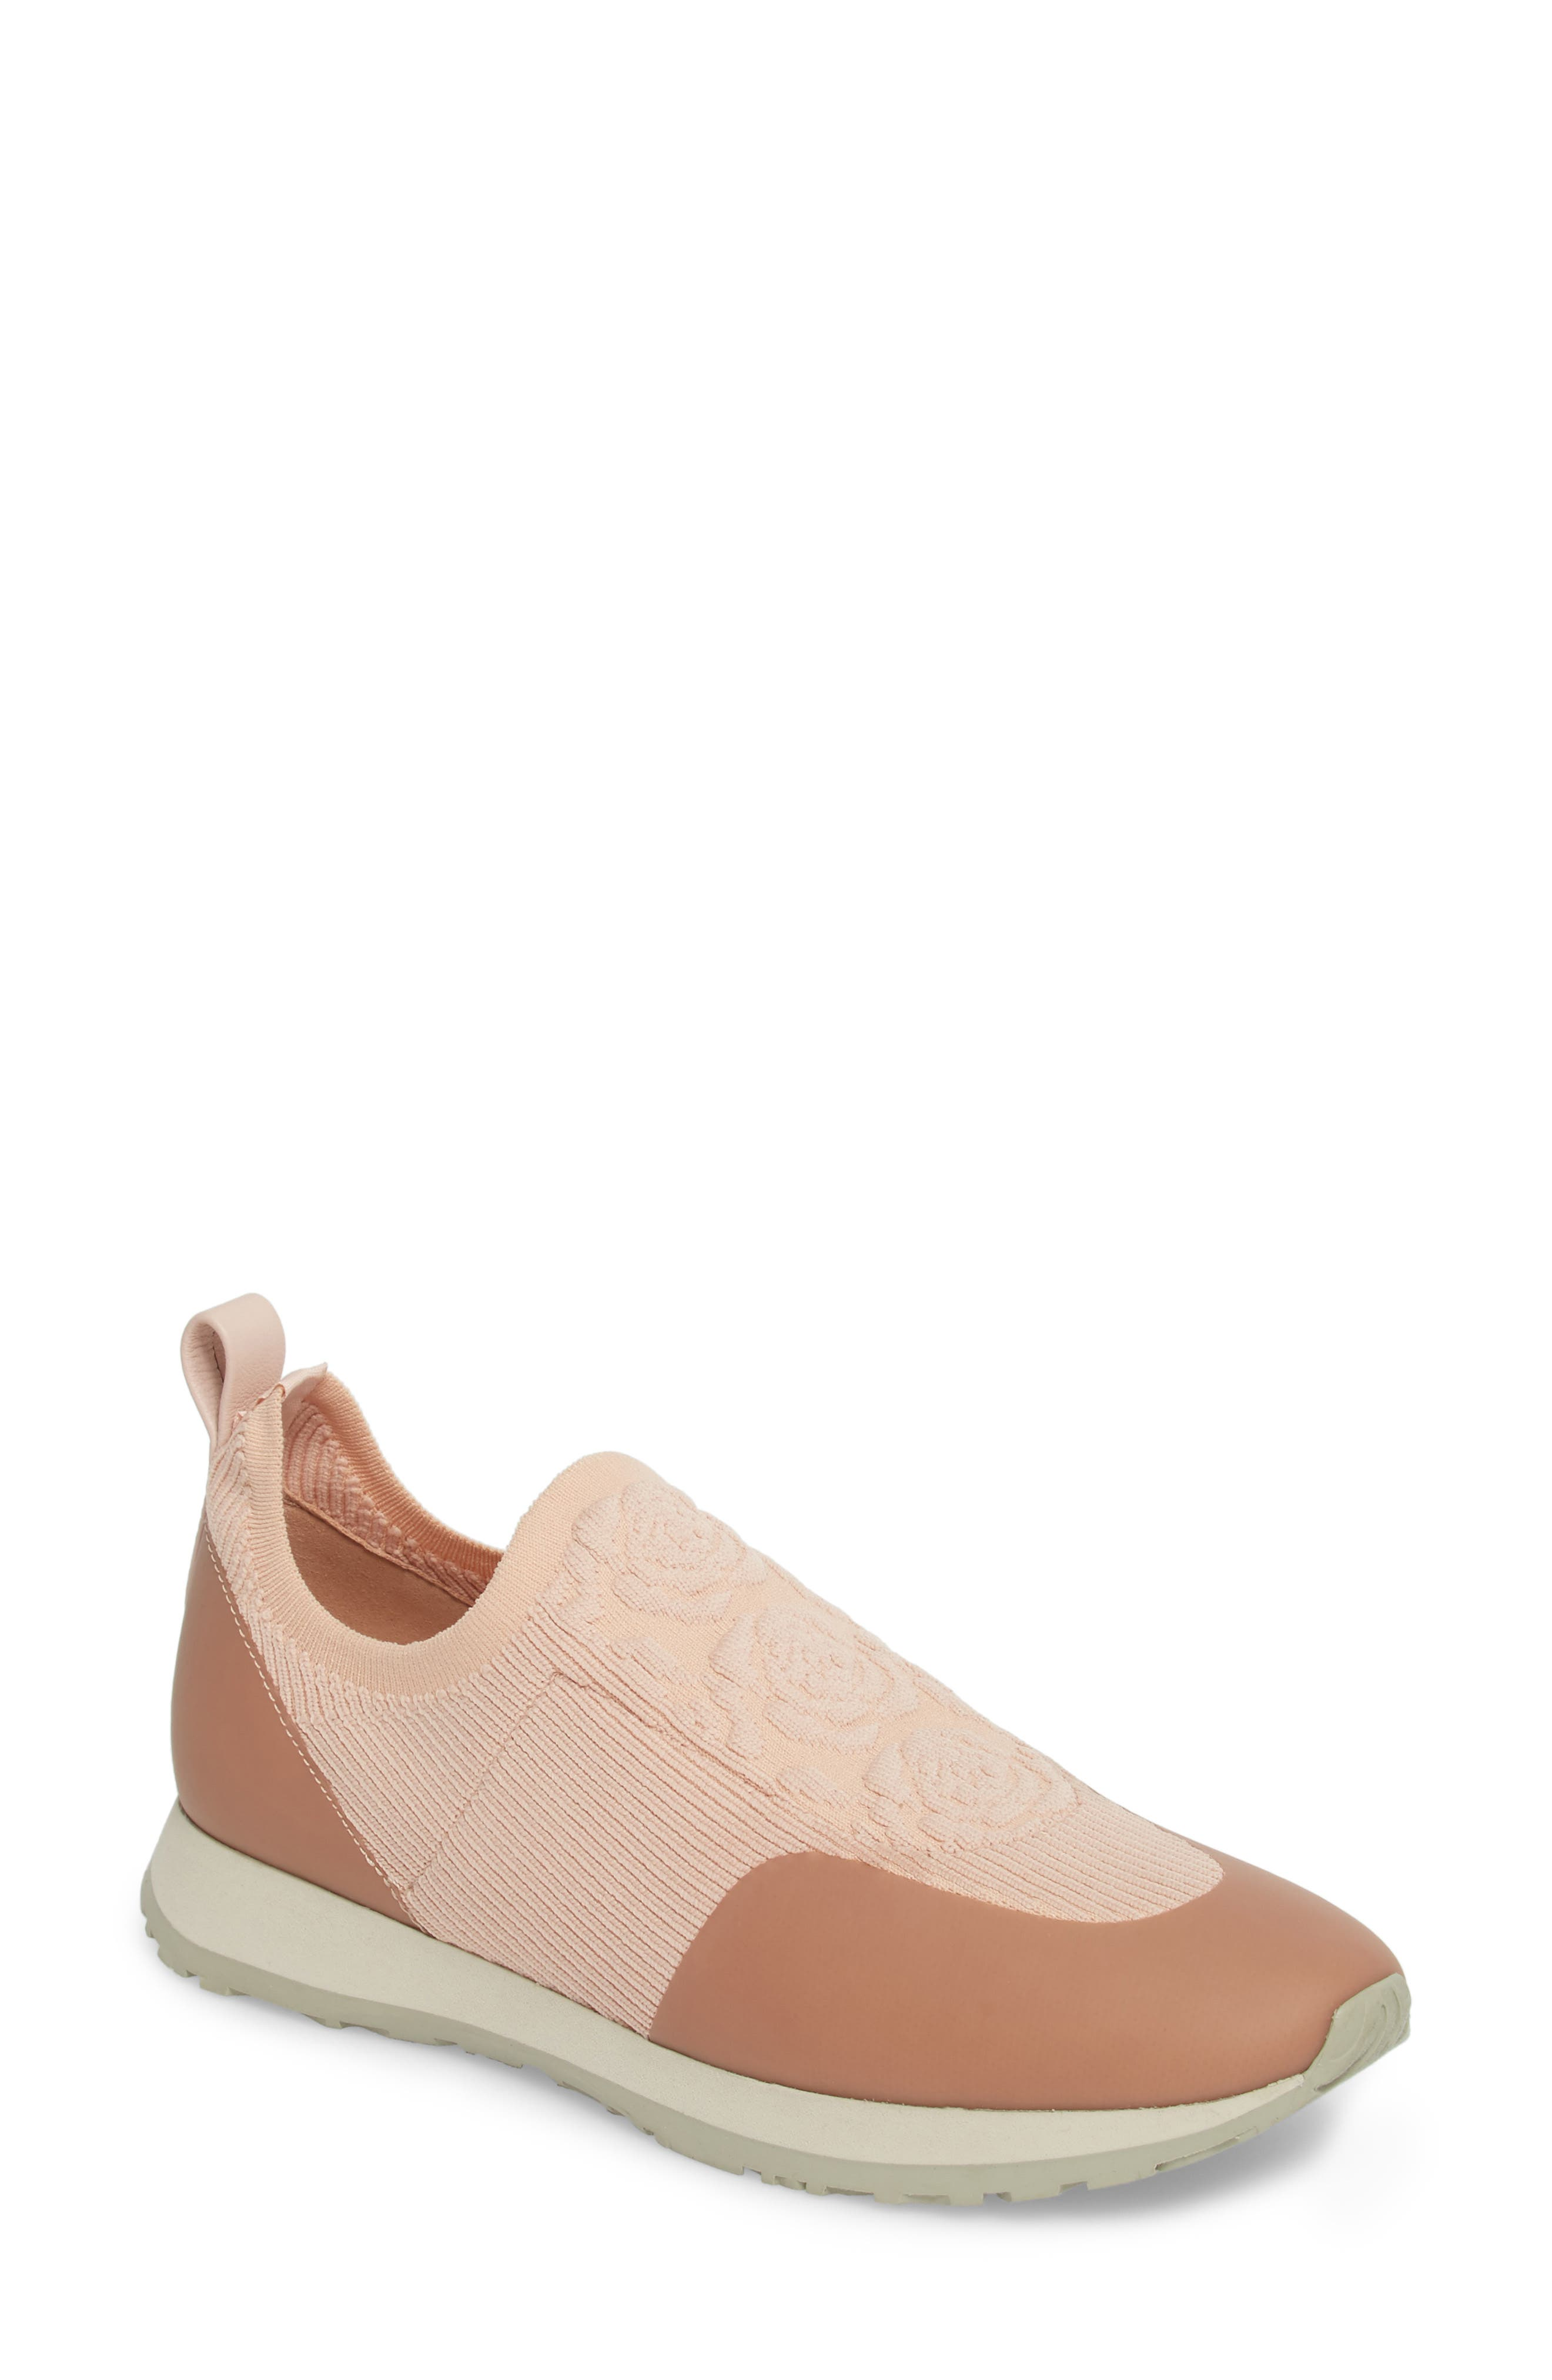 Alternate Image 1 Selected - Taryn Rose Cara Slip-On Sneaker (Women)